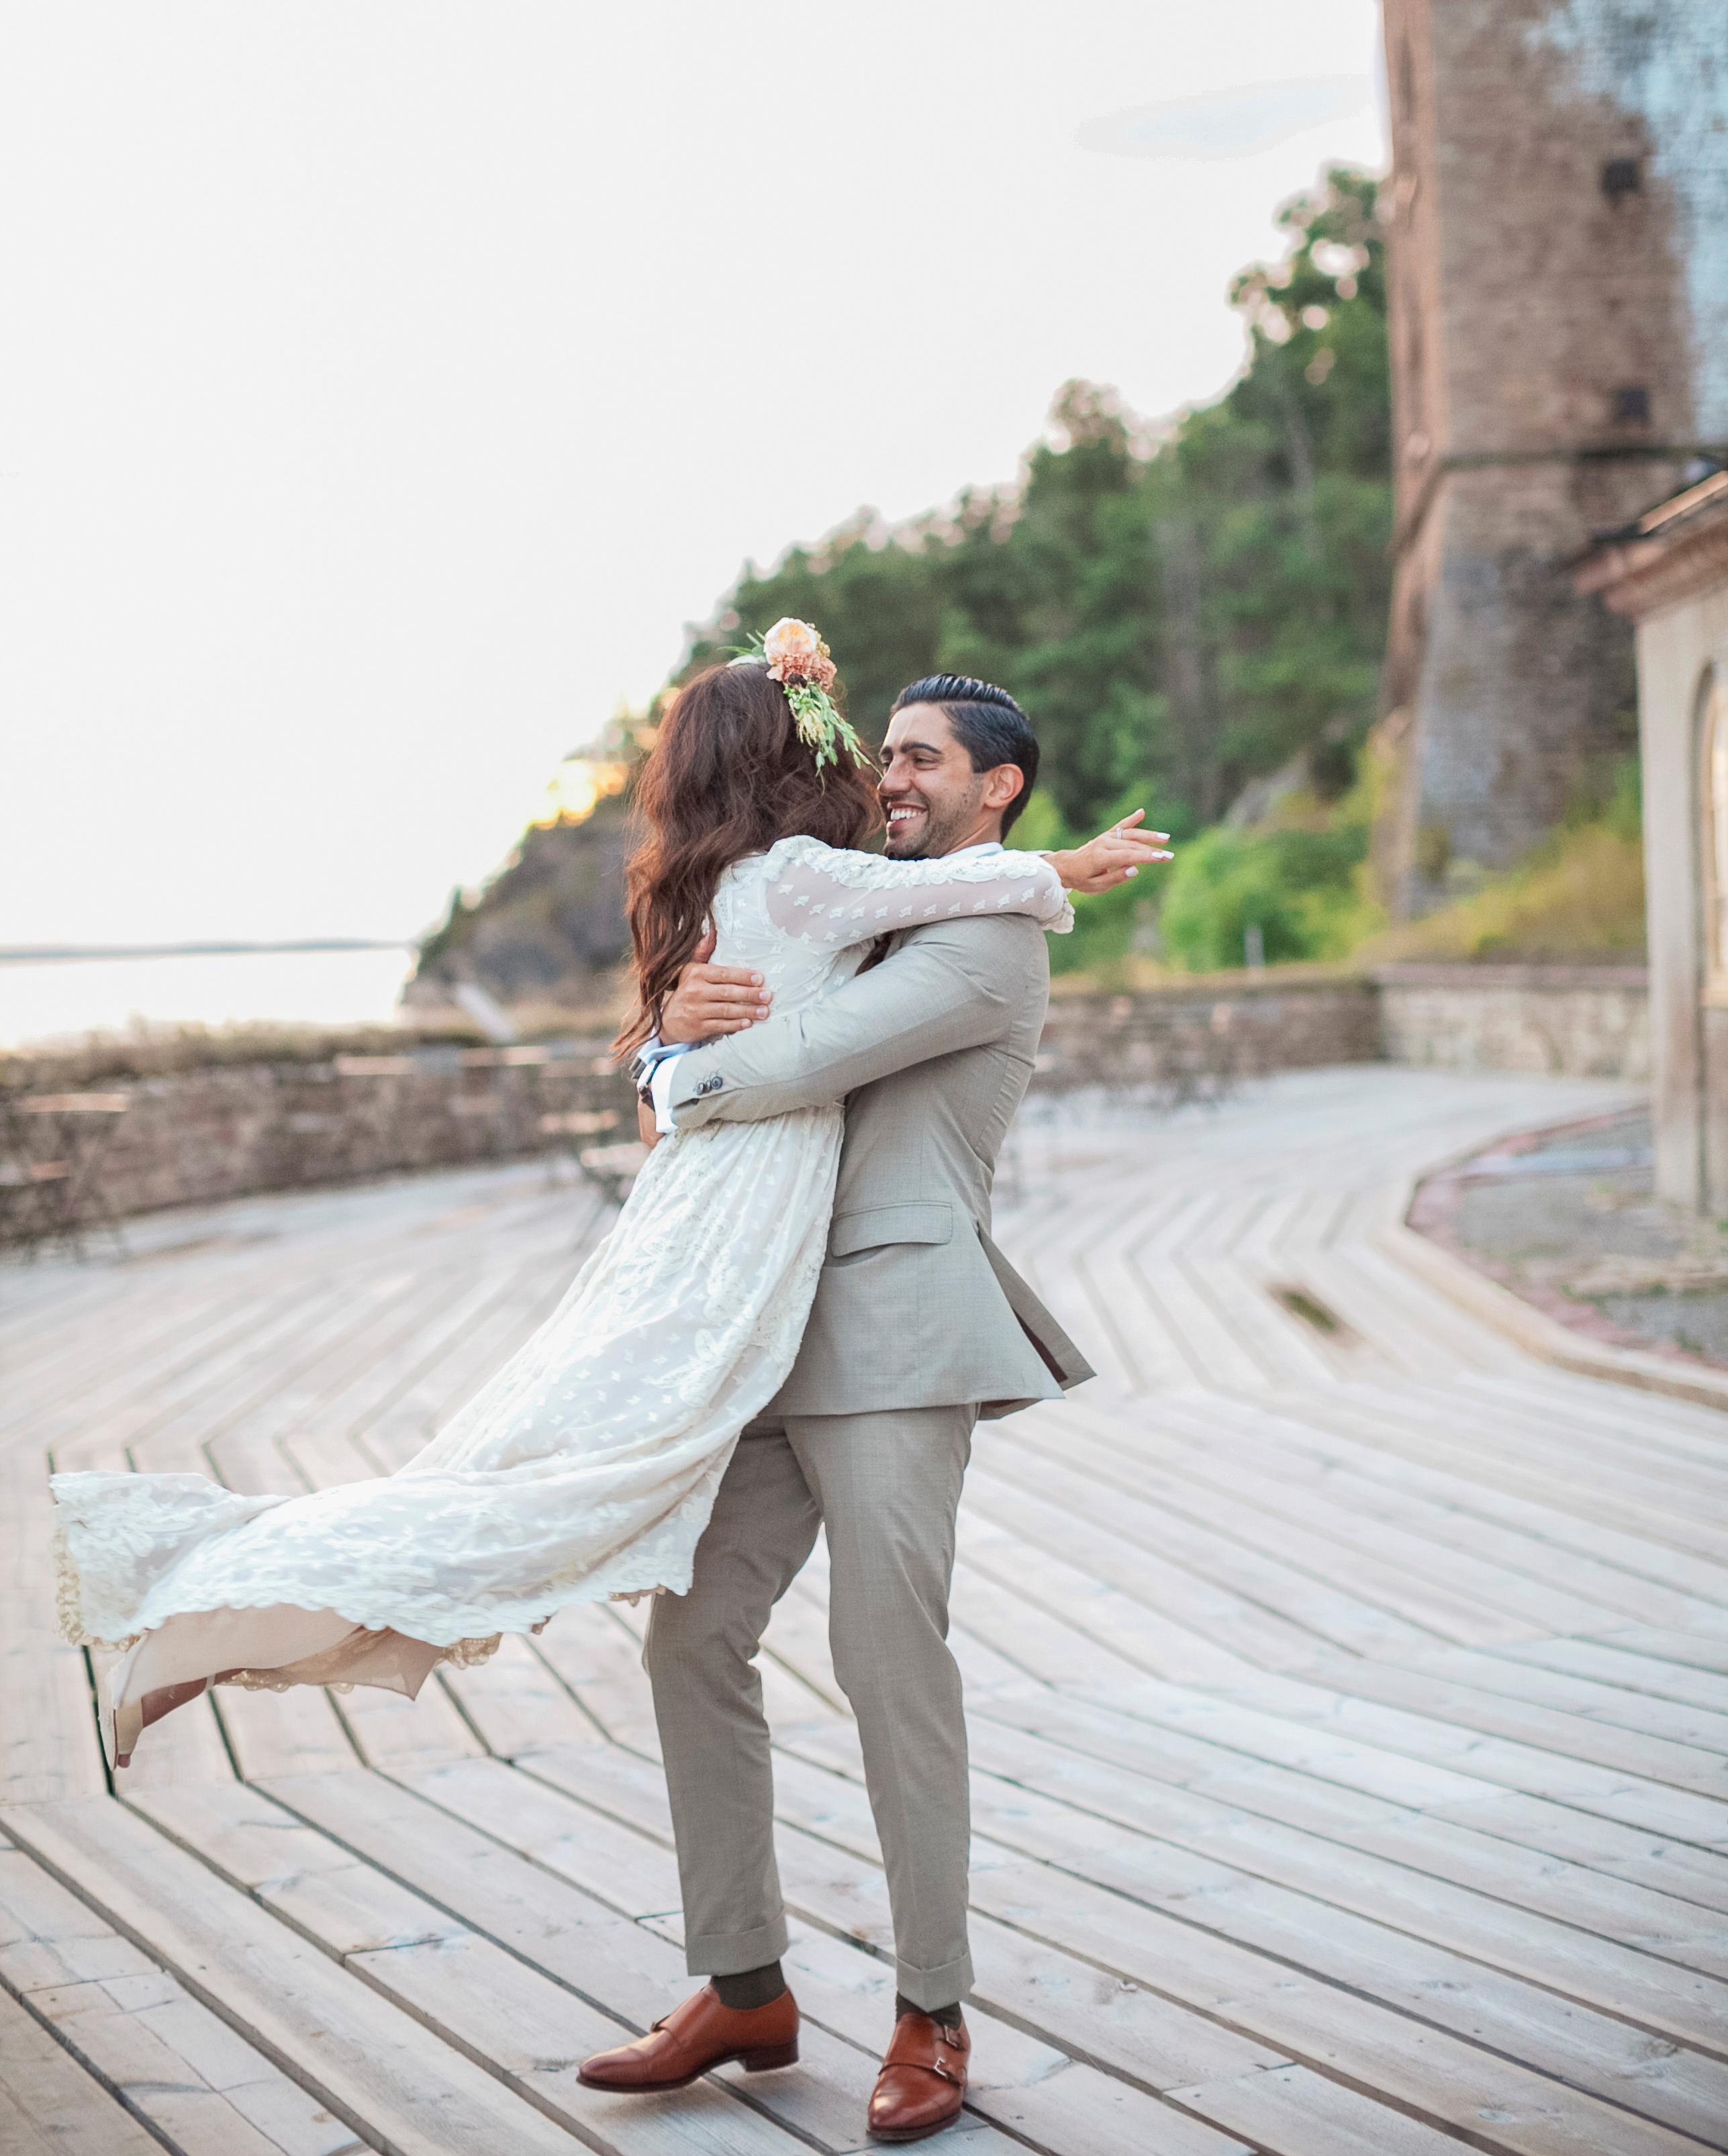 negin-chris-wedding-couple-0871-s112116-0815.jpg